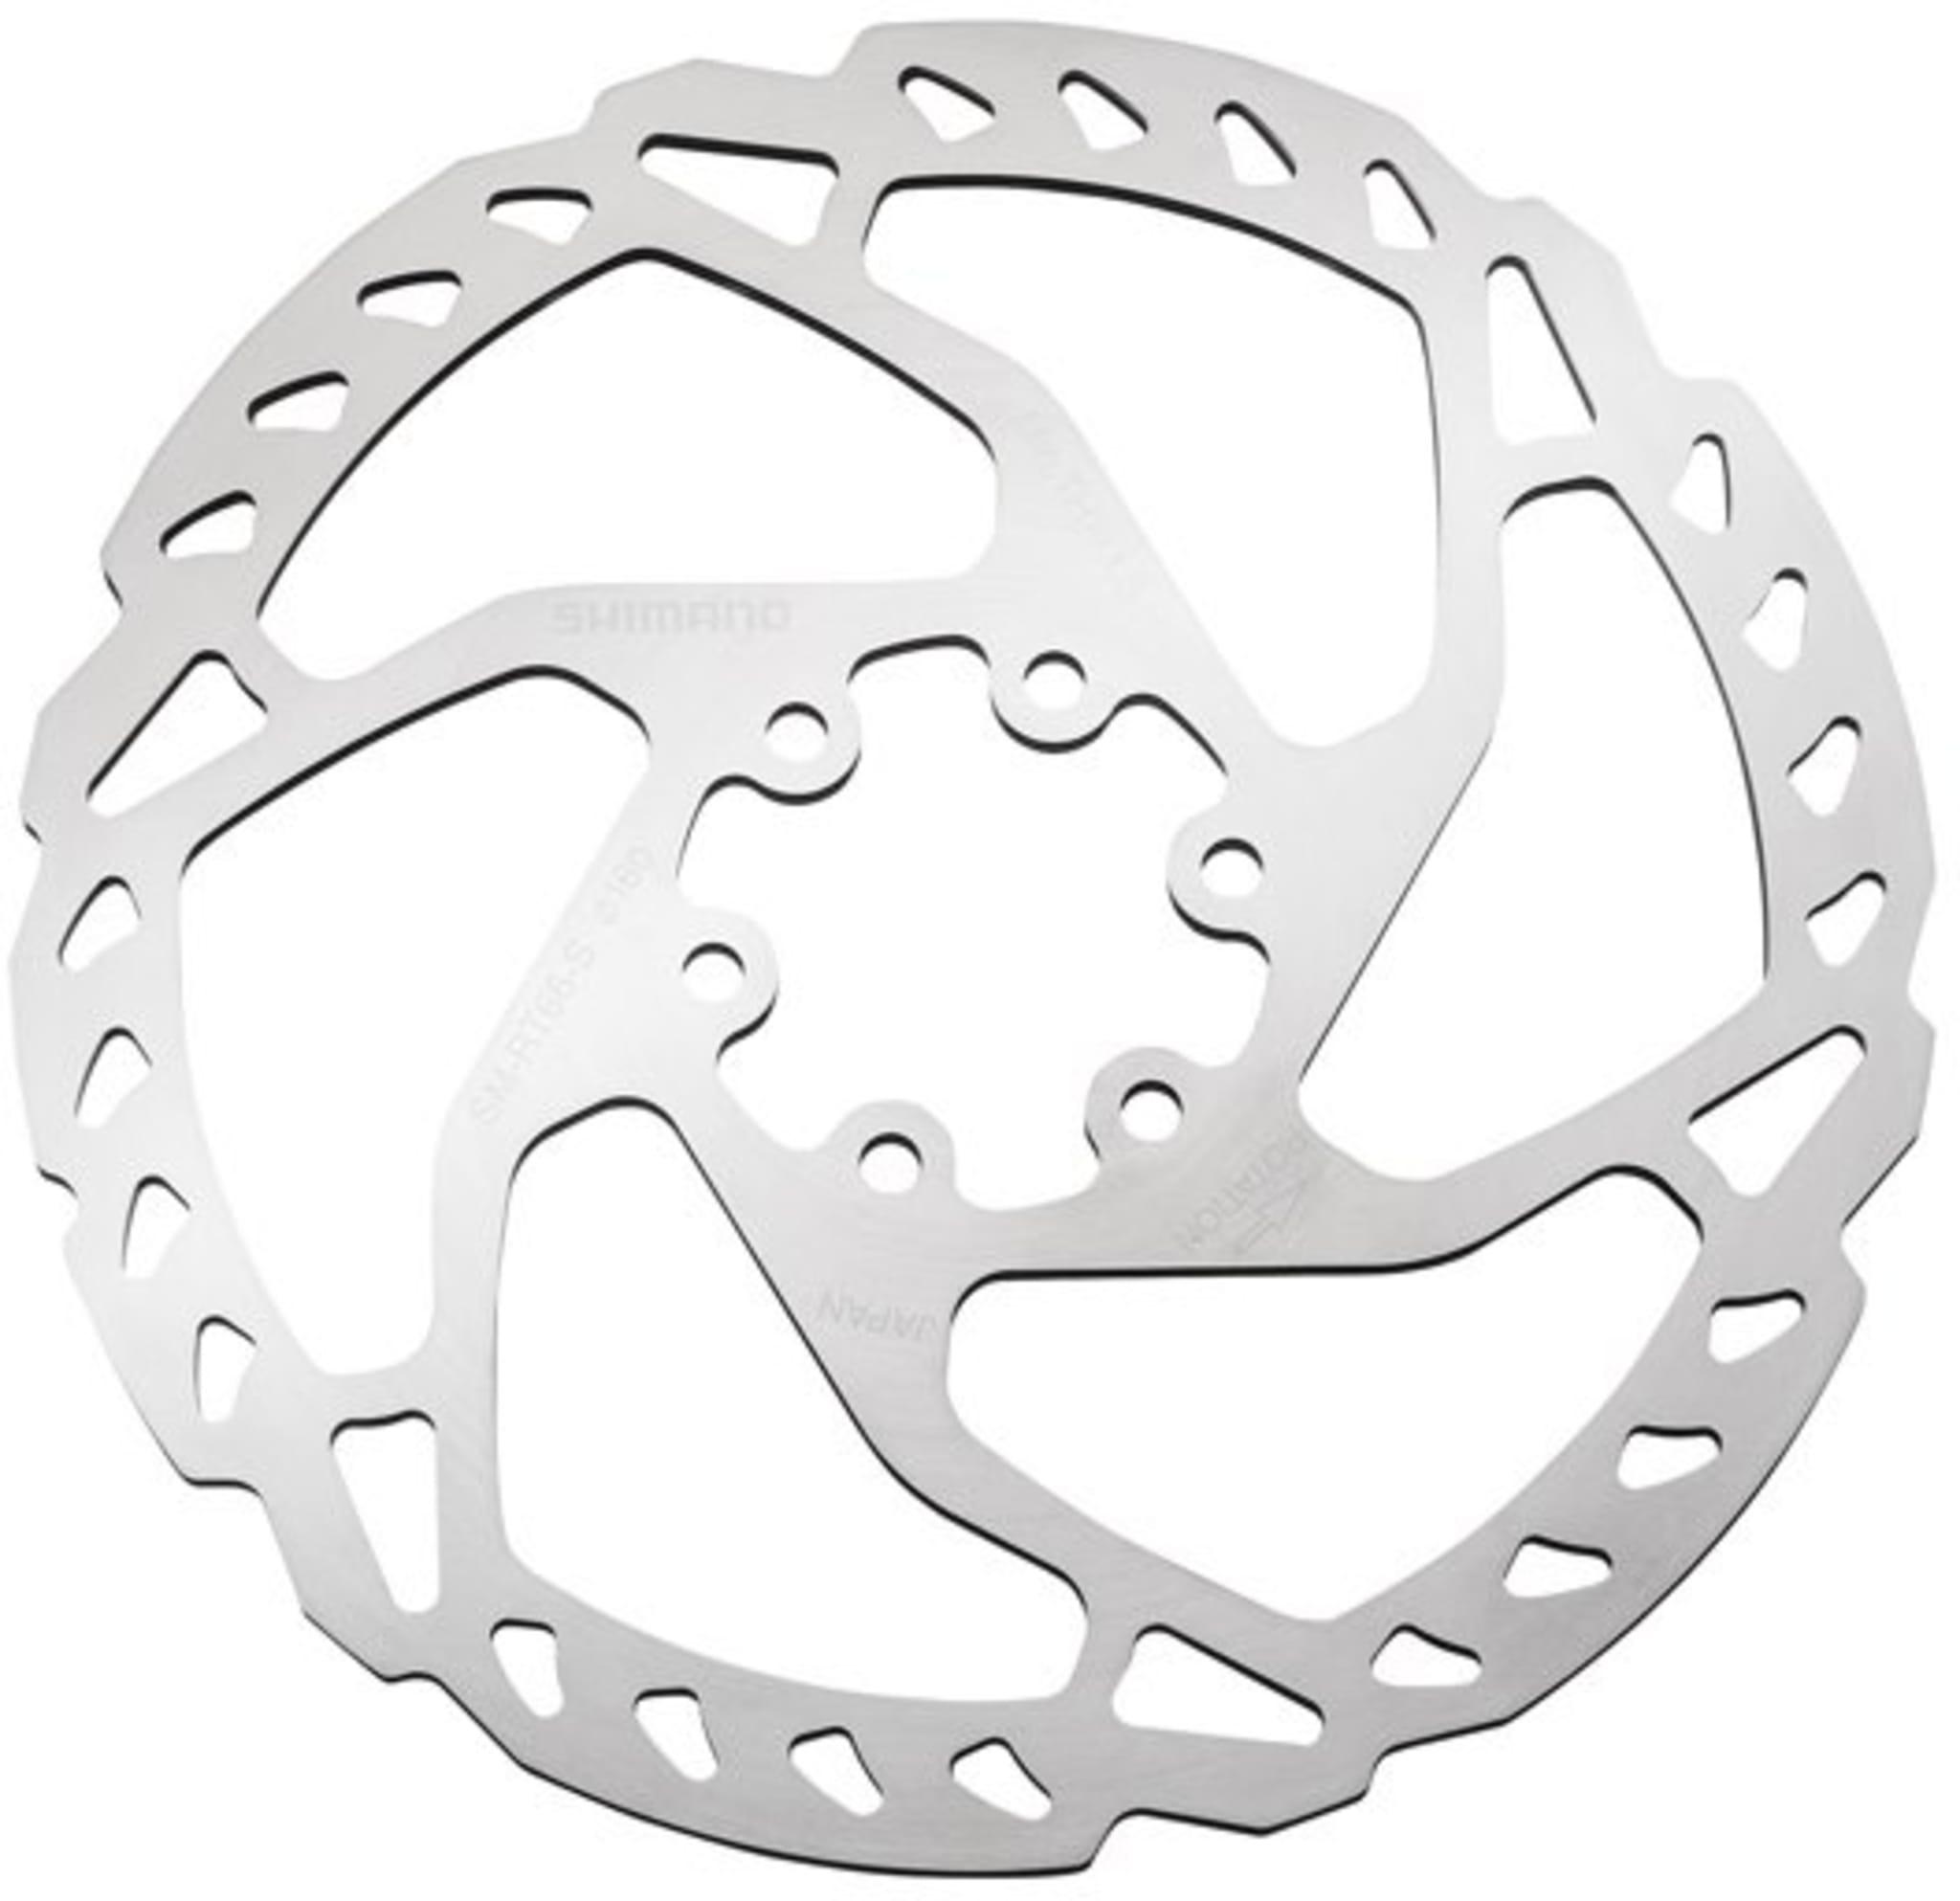 Høykvalitets bremseskive i SLX/Deore 180mm